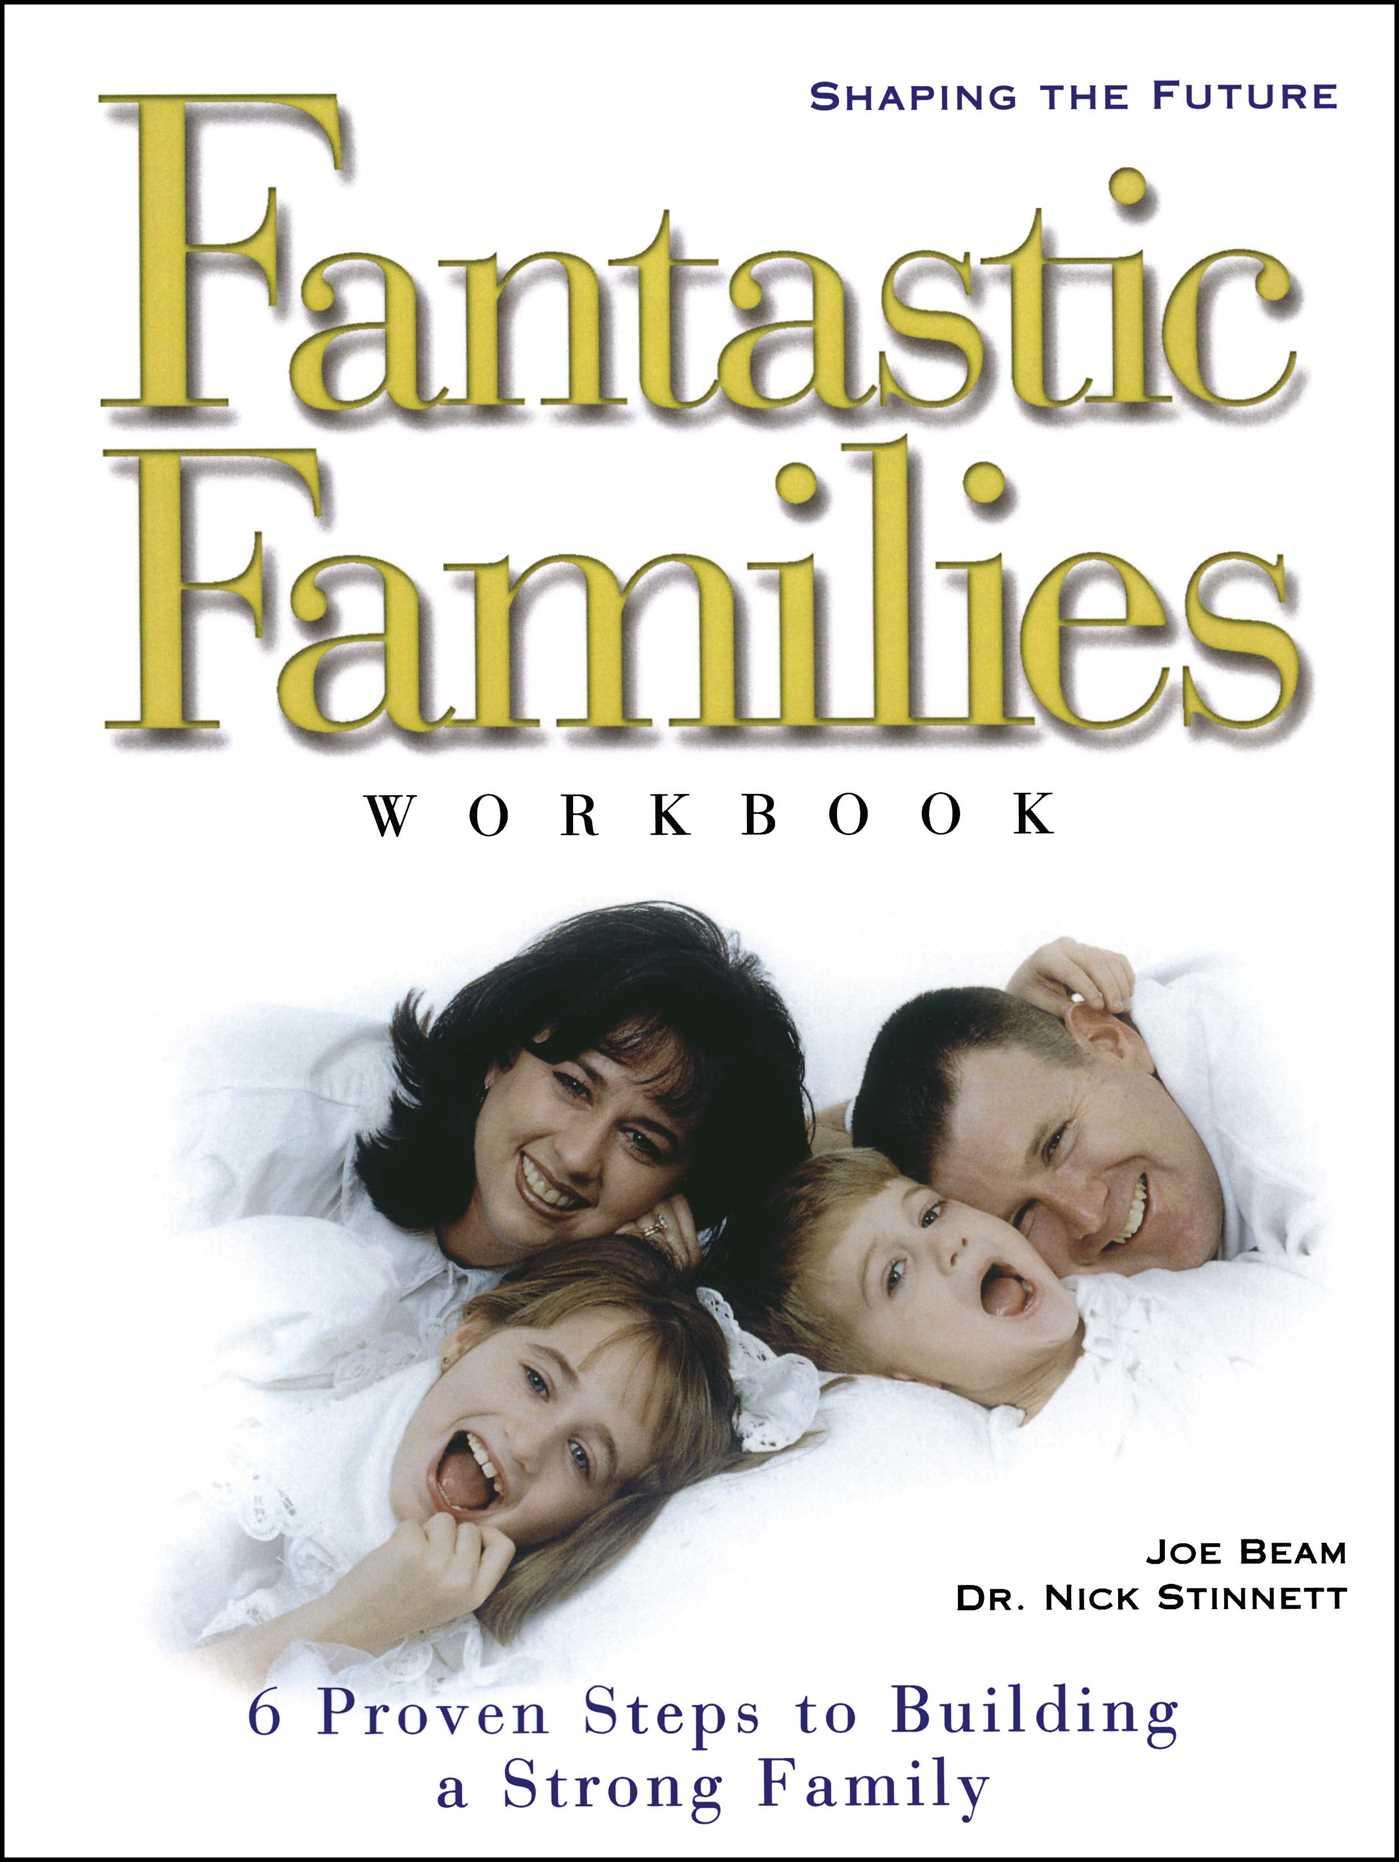 Fantastic families work book 9781582291444 hr